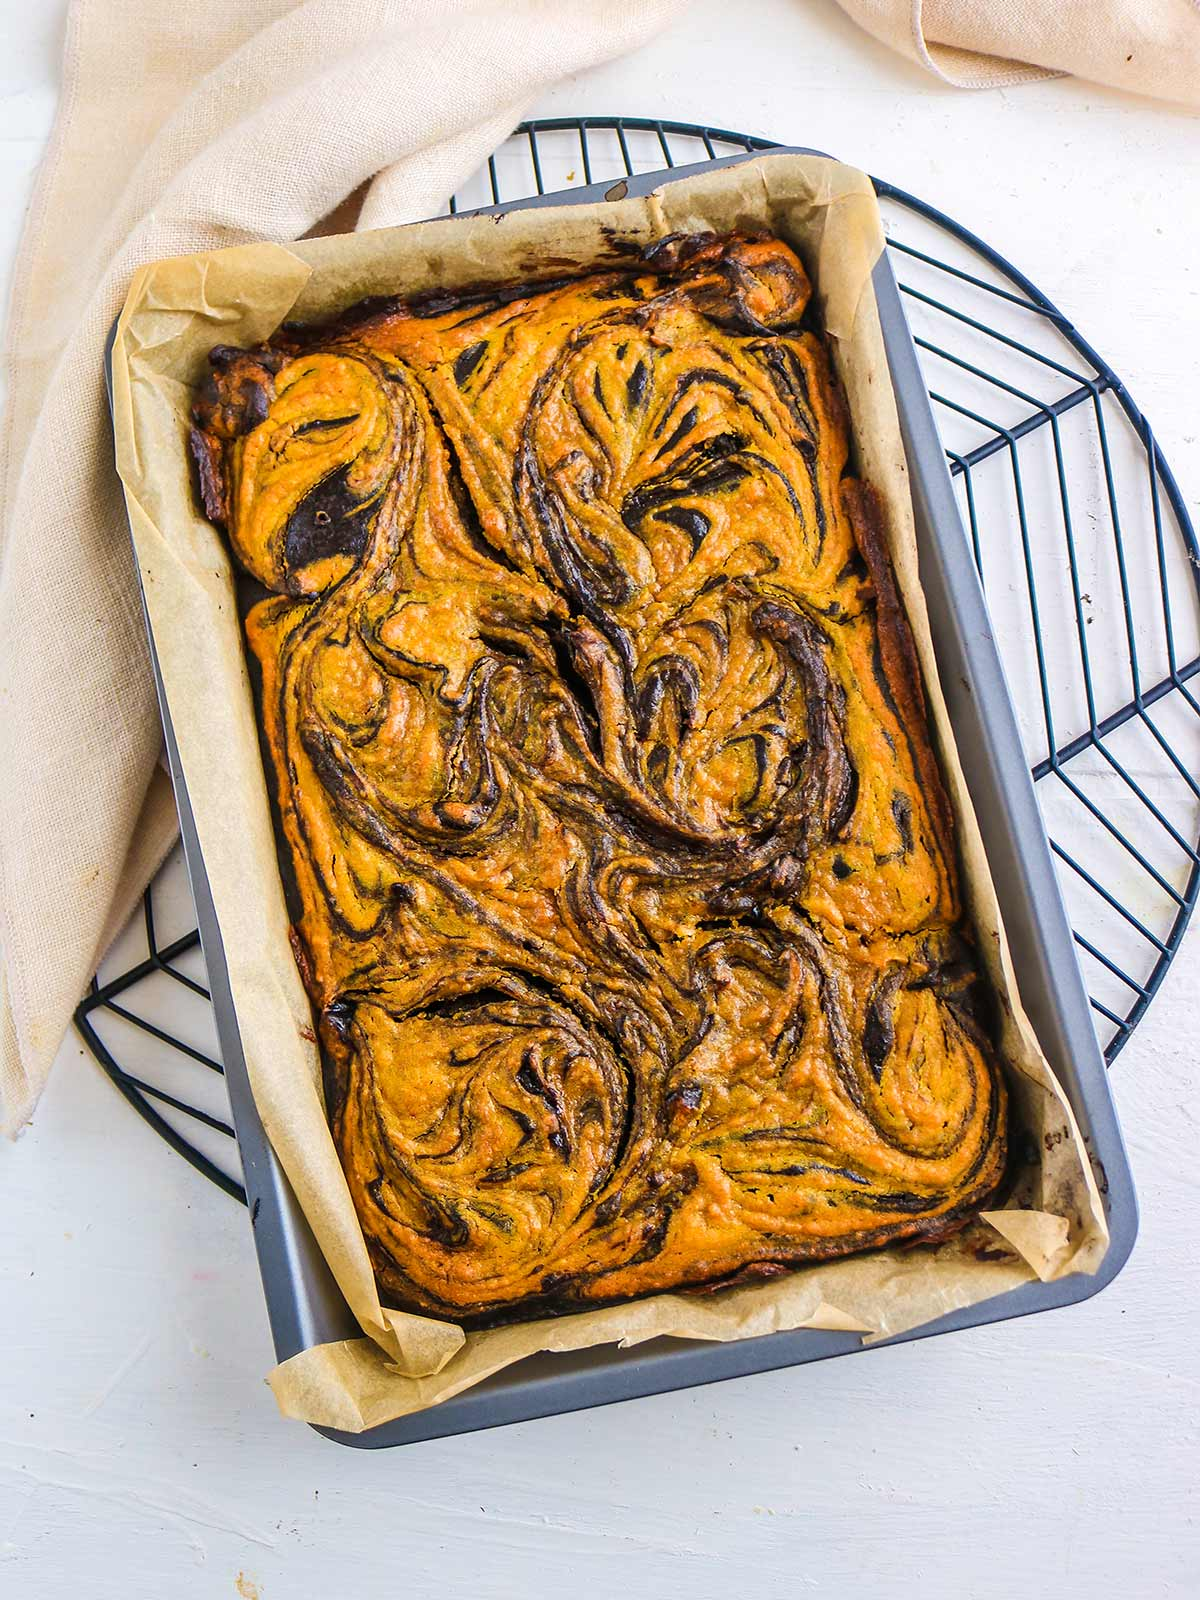 vegan pumpkin brownies out of oven before slicing